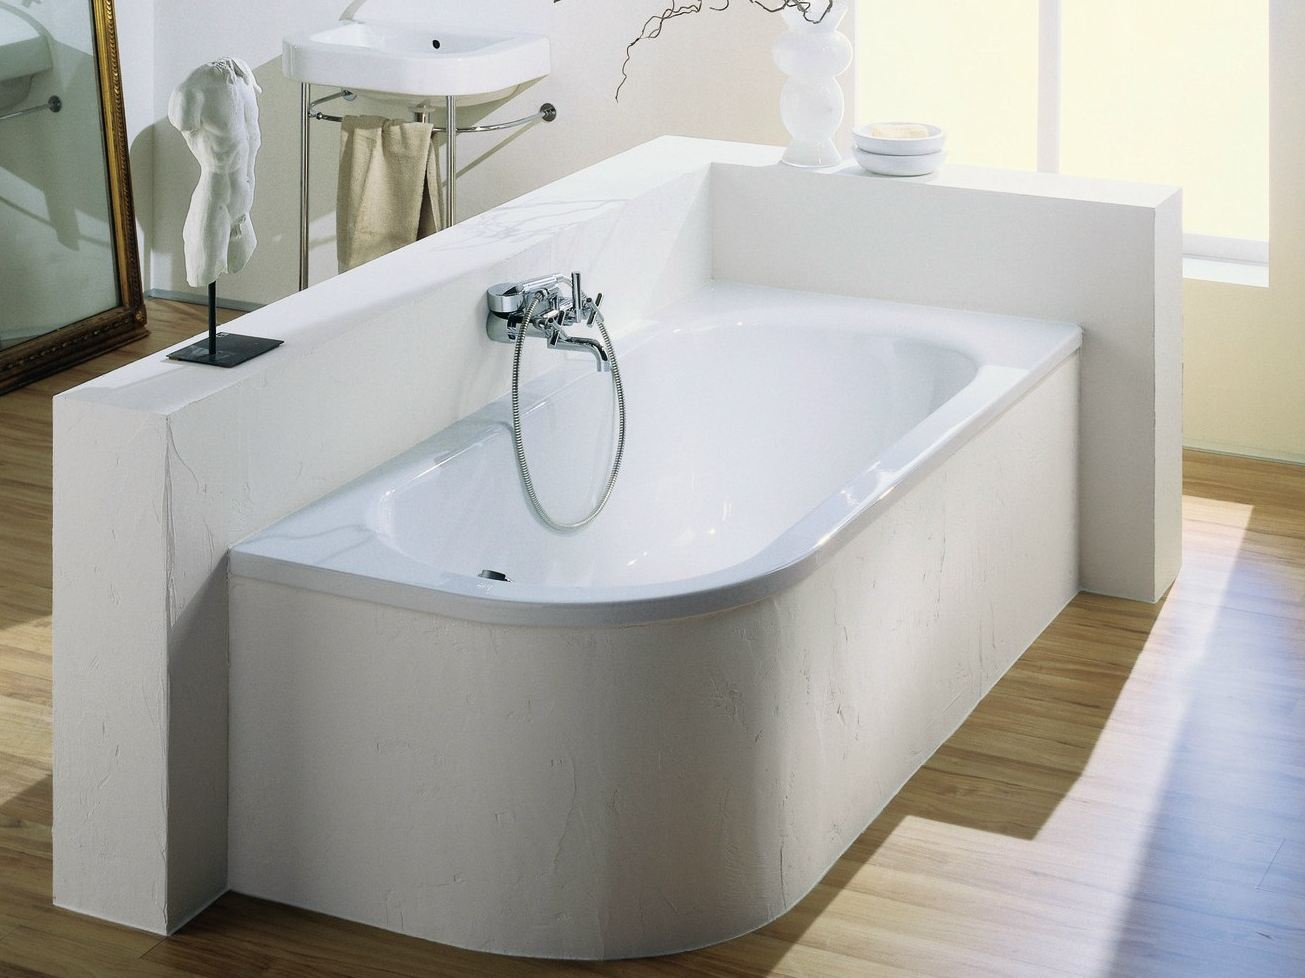 Copri Vasca Da Bagno Angolare : Vasche da bagno piccole. vasche da bagno piccole with vasche da